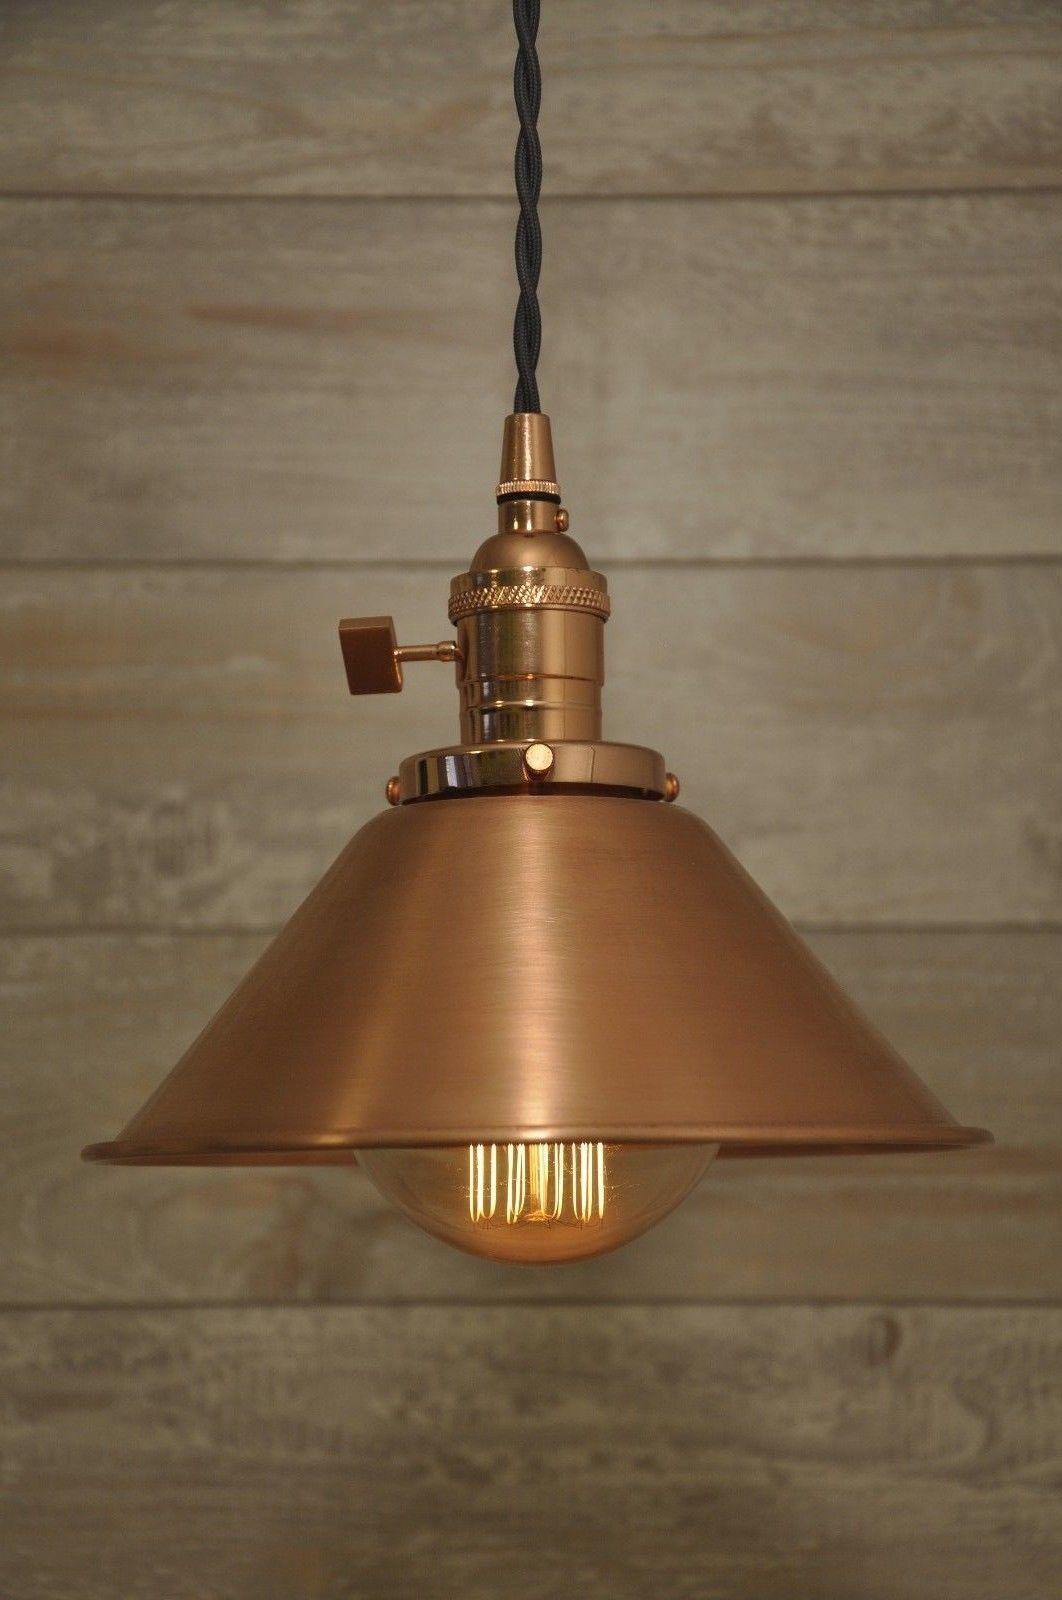 industrial look lighting. Brushed Copper Spun Cone Industrial Pendant Light Fixture Rustic Vintage Retro | EBay Look Lighting L